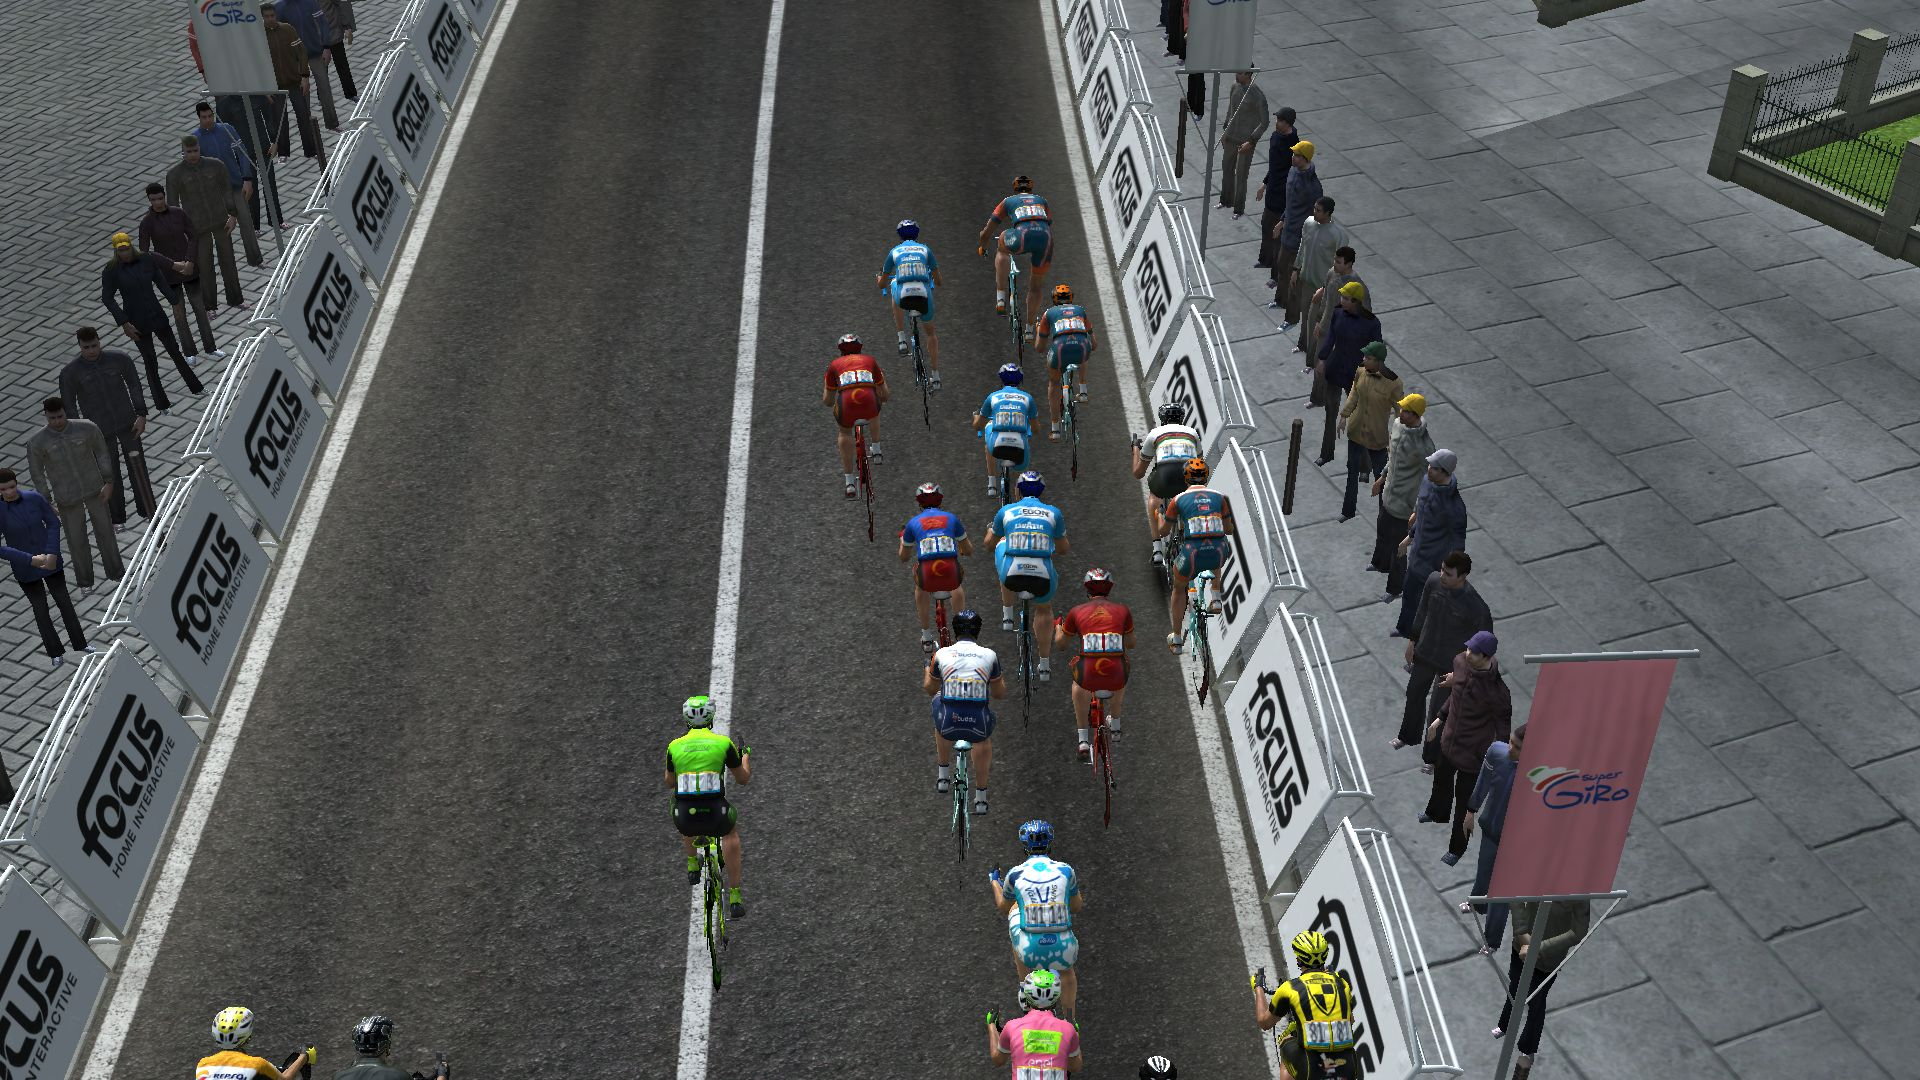 pcmdaily.com/images/mg/2019/Races/GTM/Giro/mg19_giro_18_PCM0274.jpg